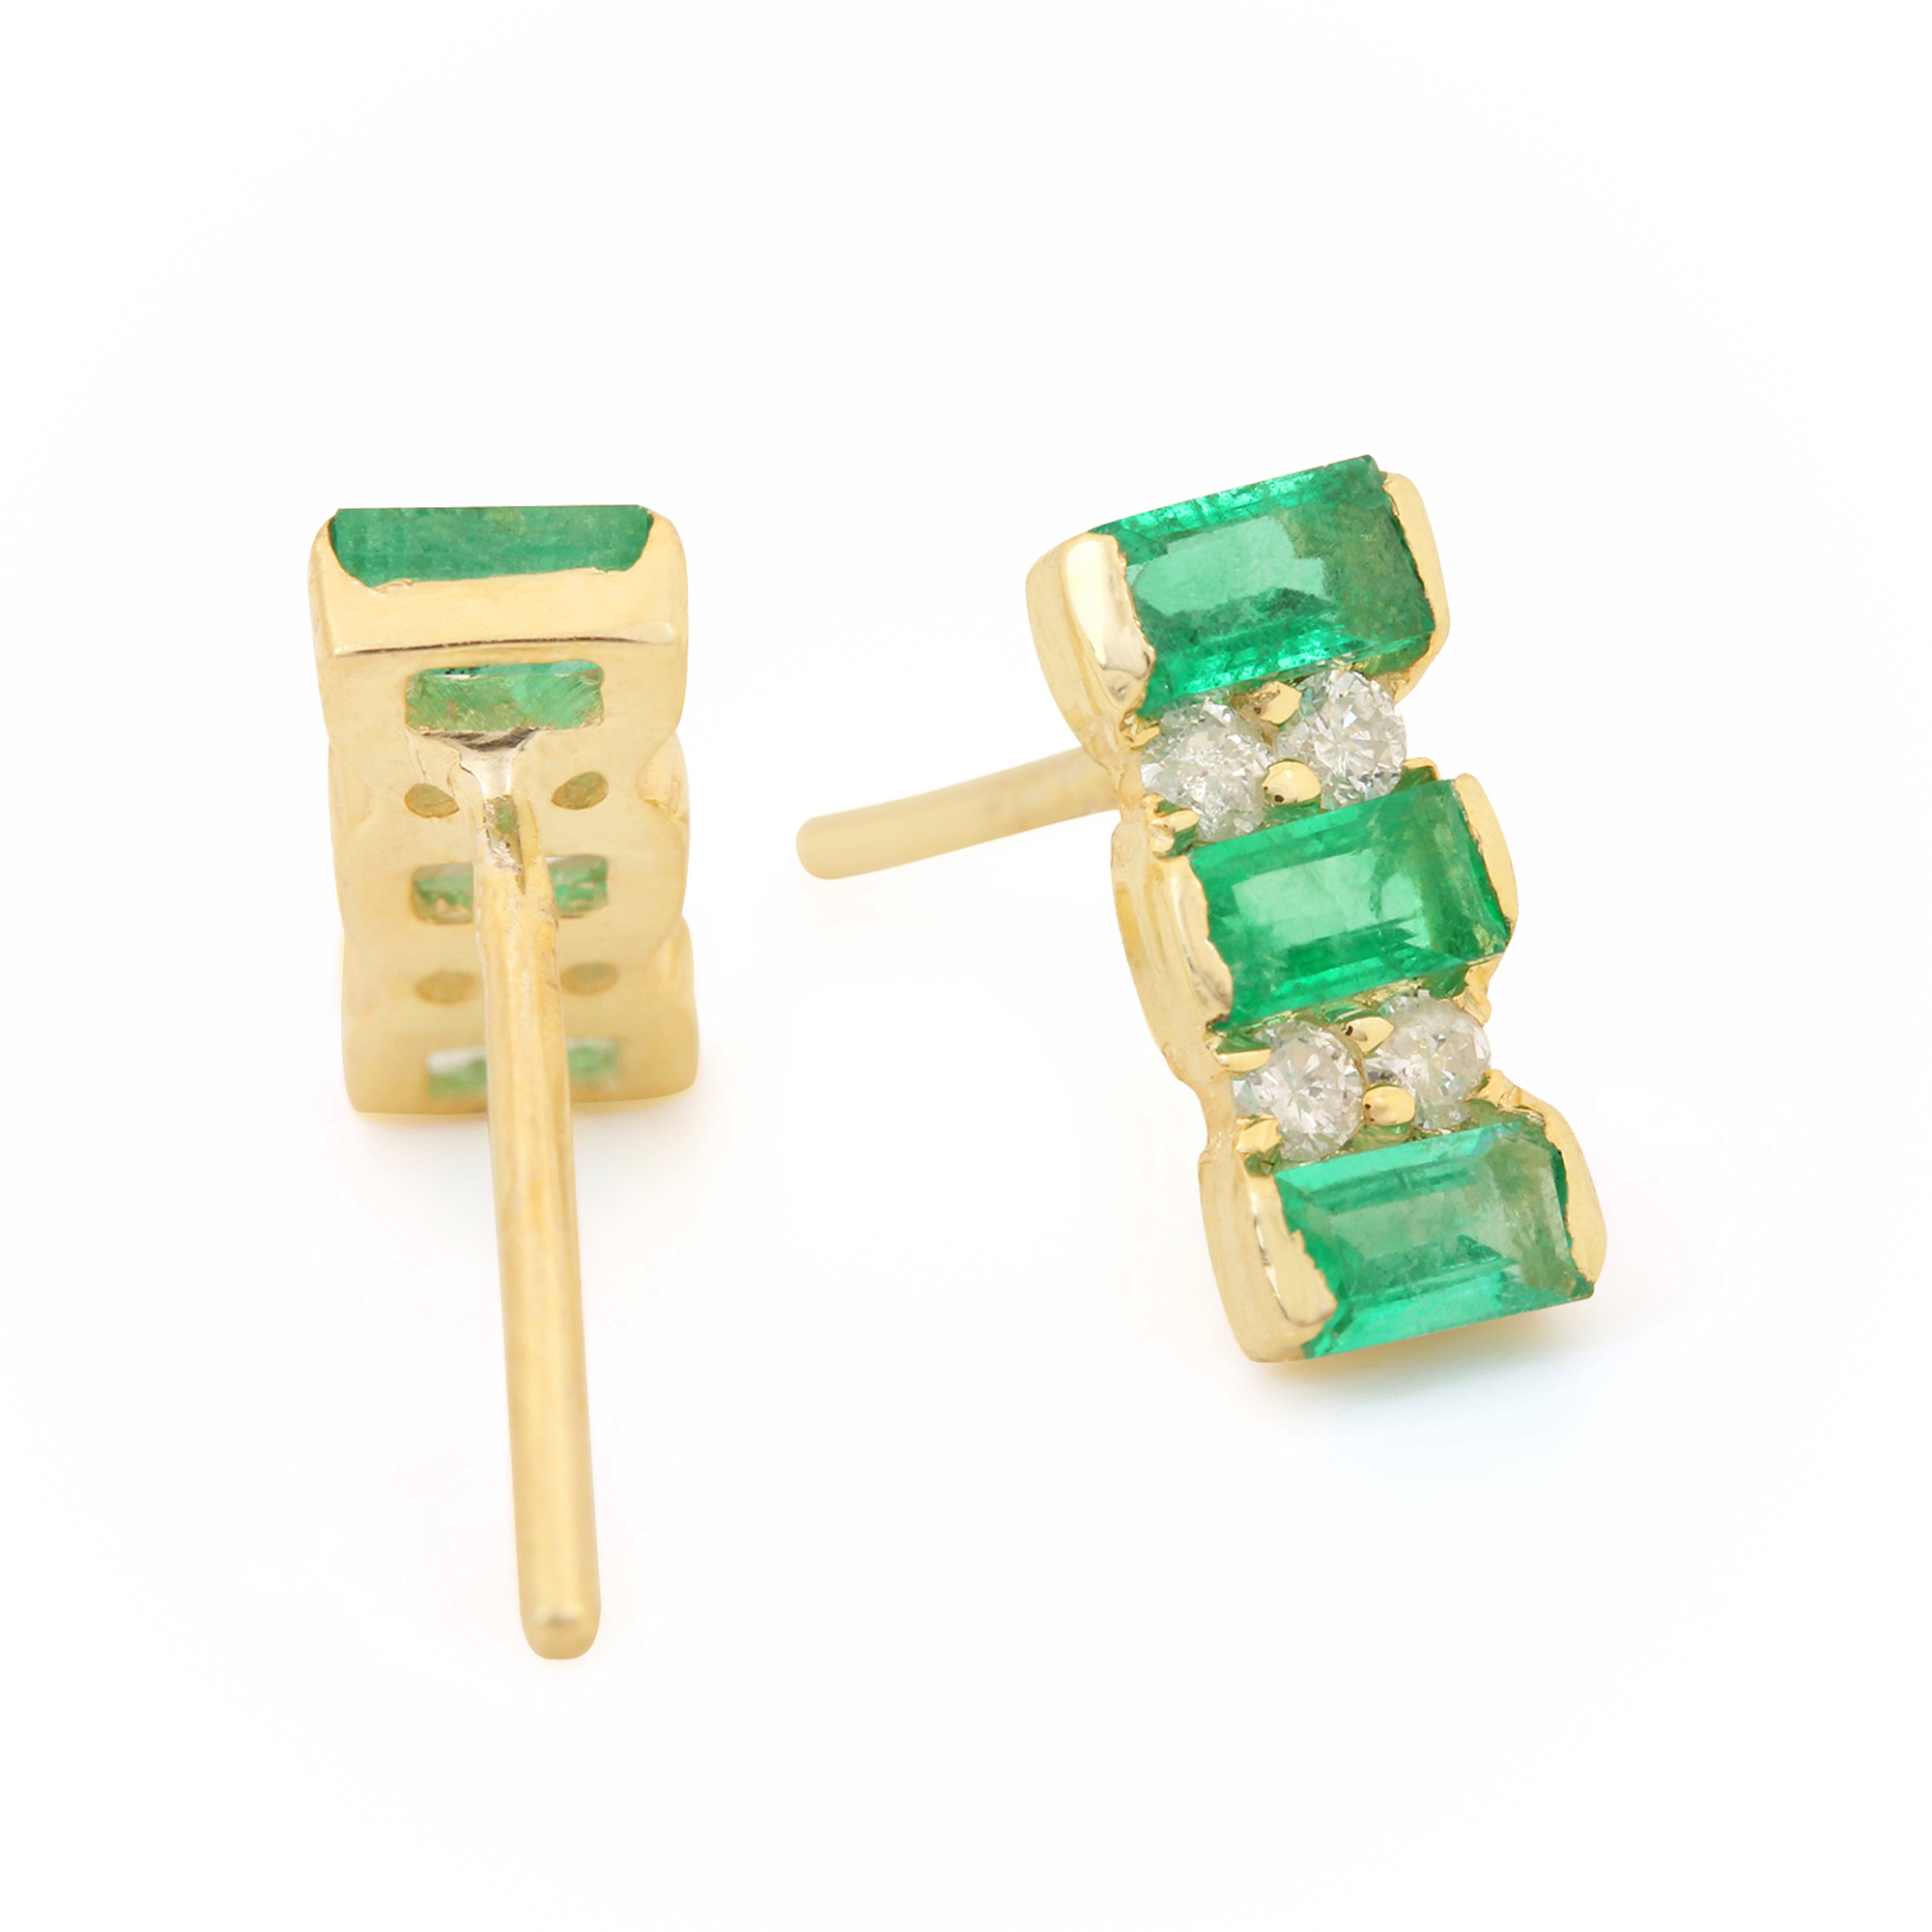 Diamond & Solitaire Emerald Gemstone 14k Solid Gold Stud Earrings